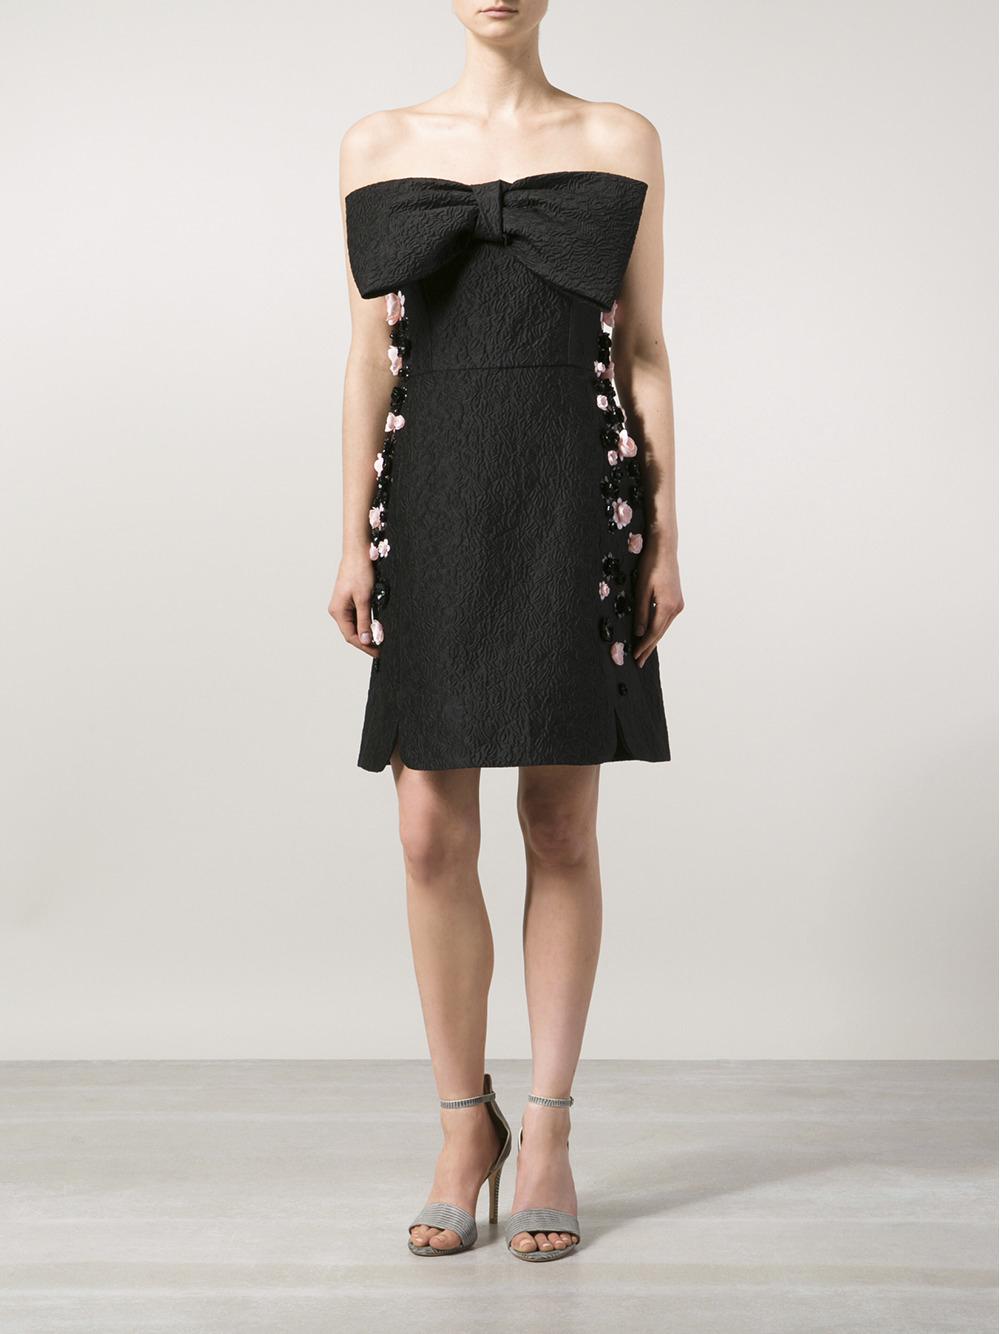 Lyst Giambattista Valli Strapless Bow Dress In Black